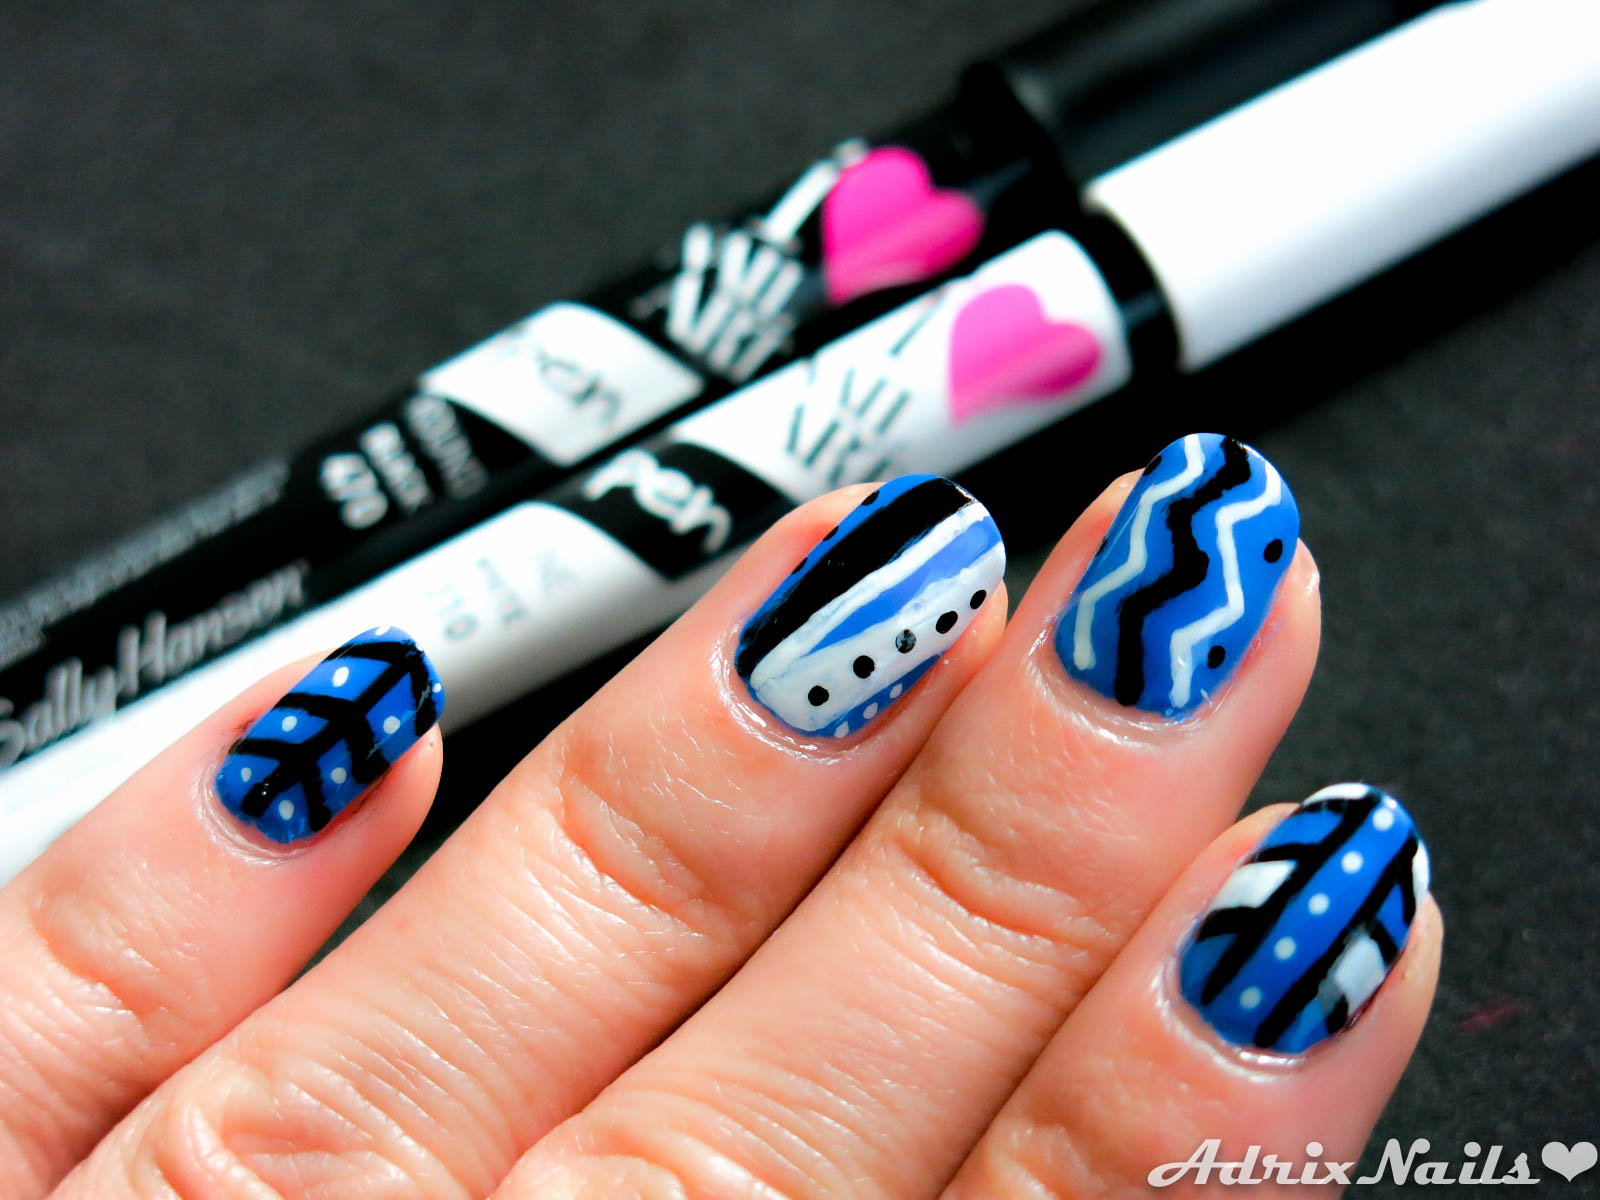 pacific blue y nail art pens – sally hansen-9 | adrix nails: uñas